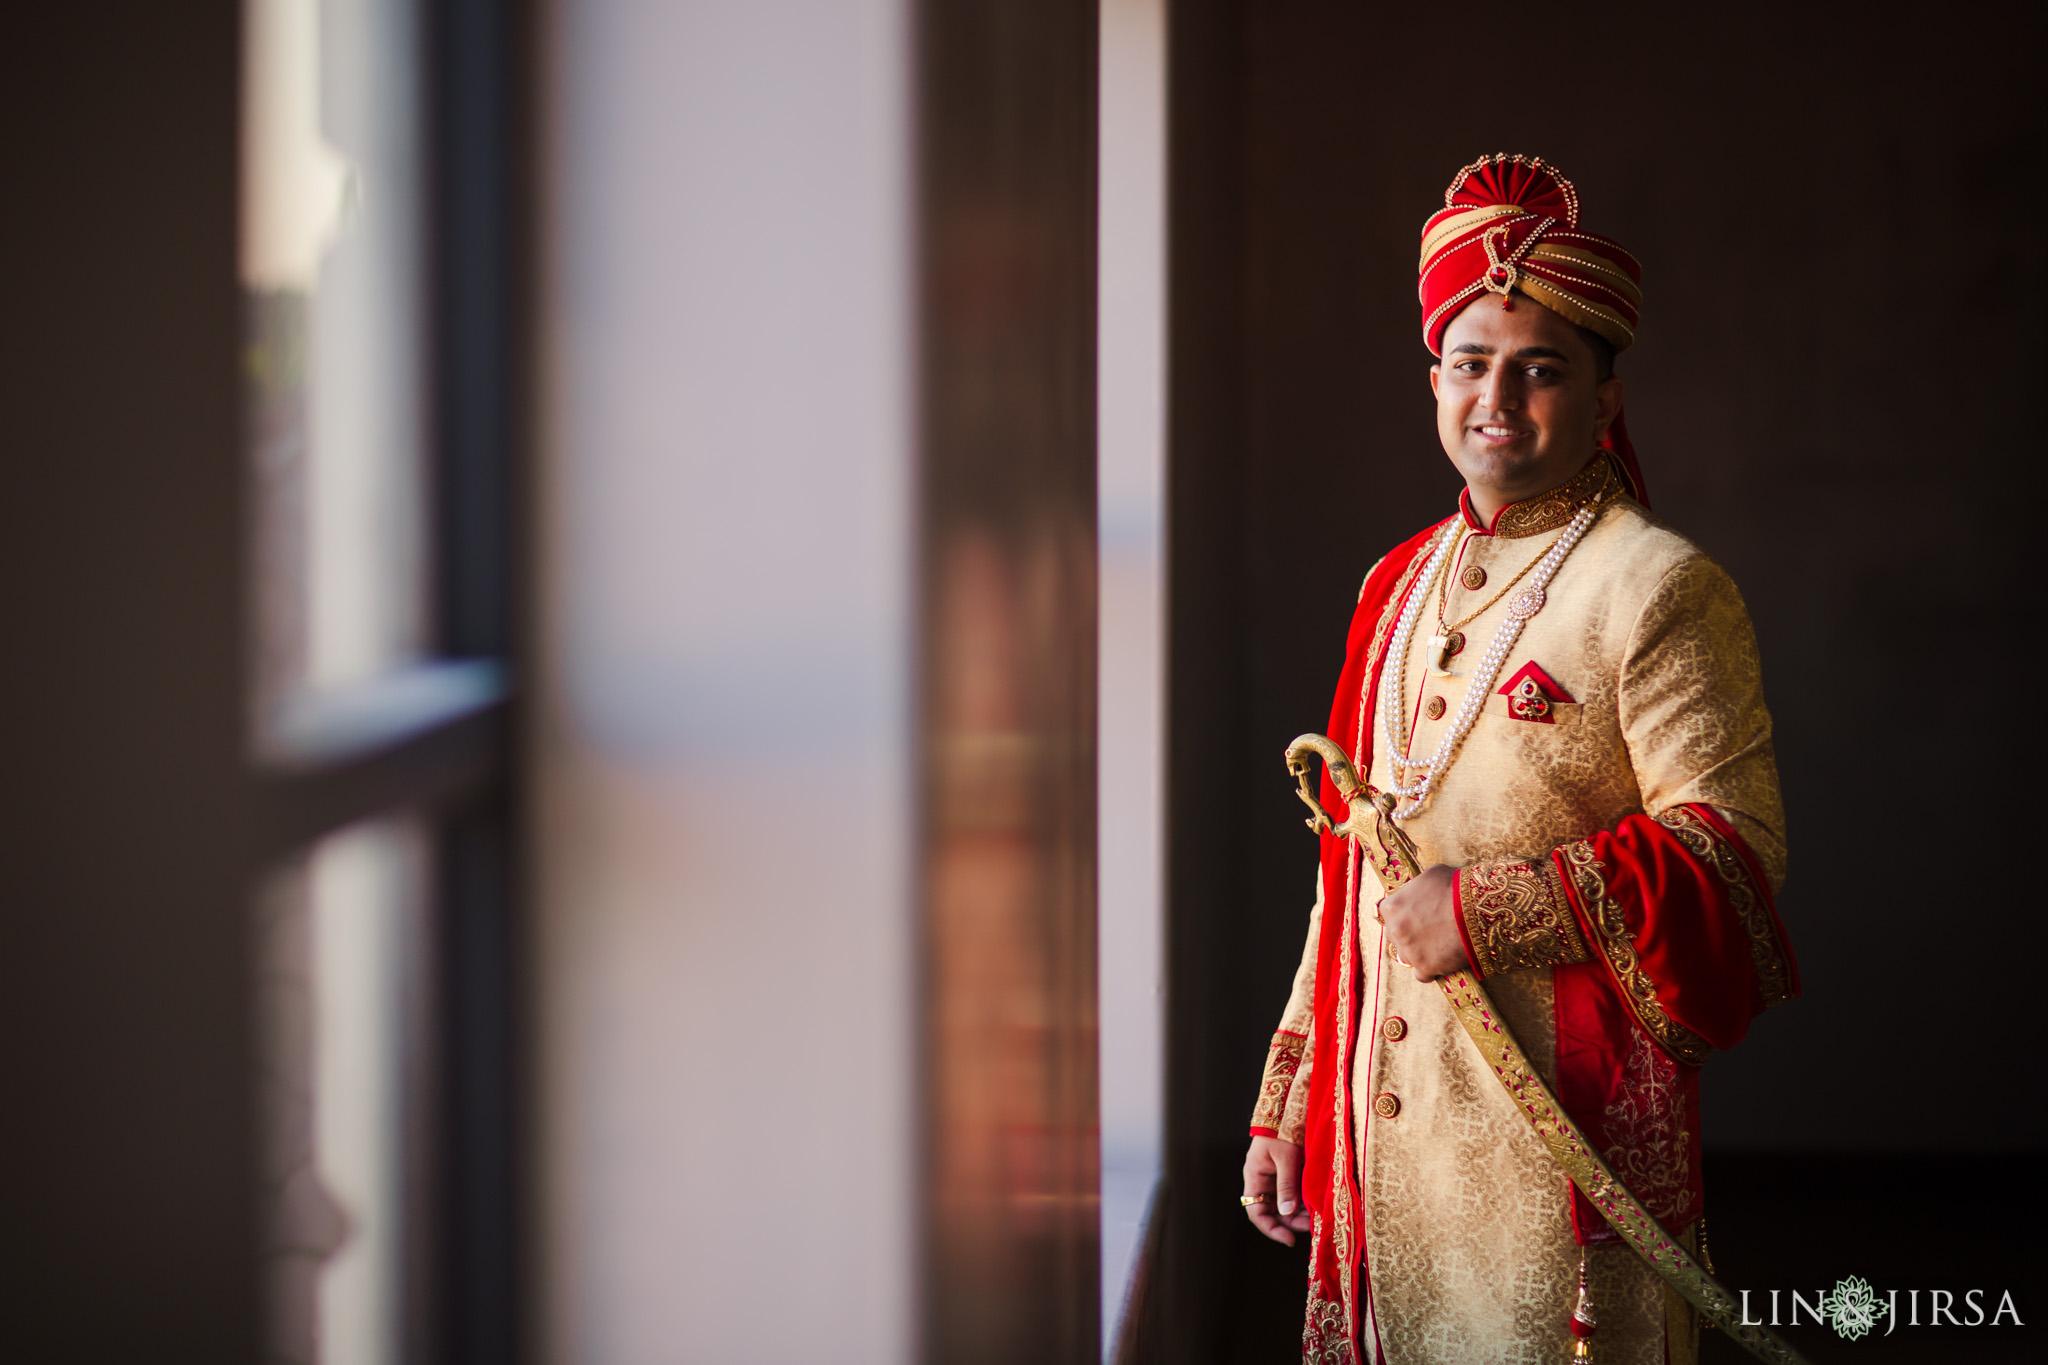 070 BAPS Swaminarayan Sanstha Chino Hills Indian Wedding Photography